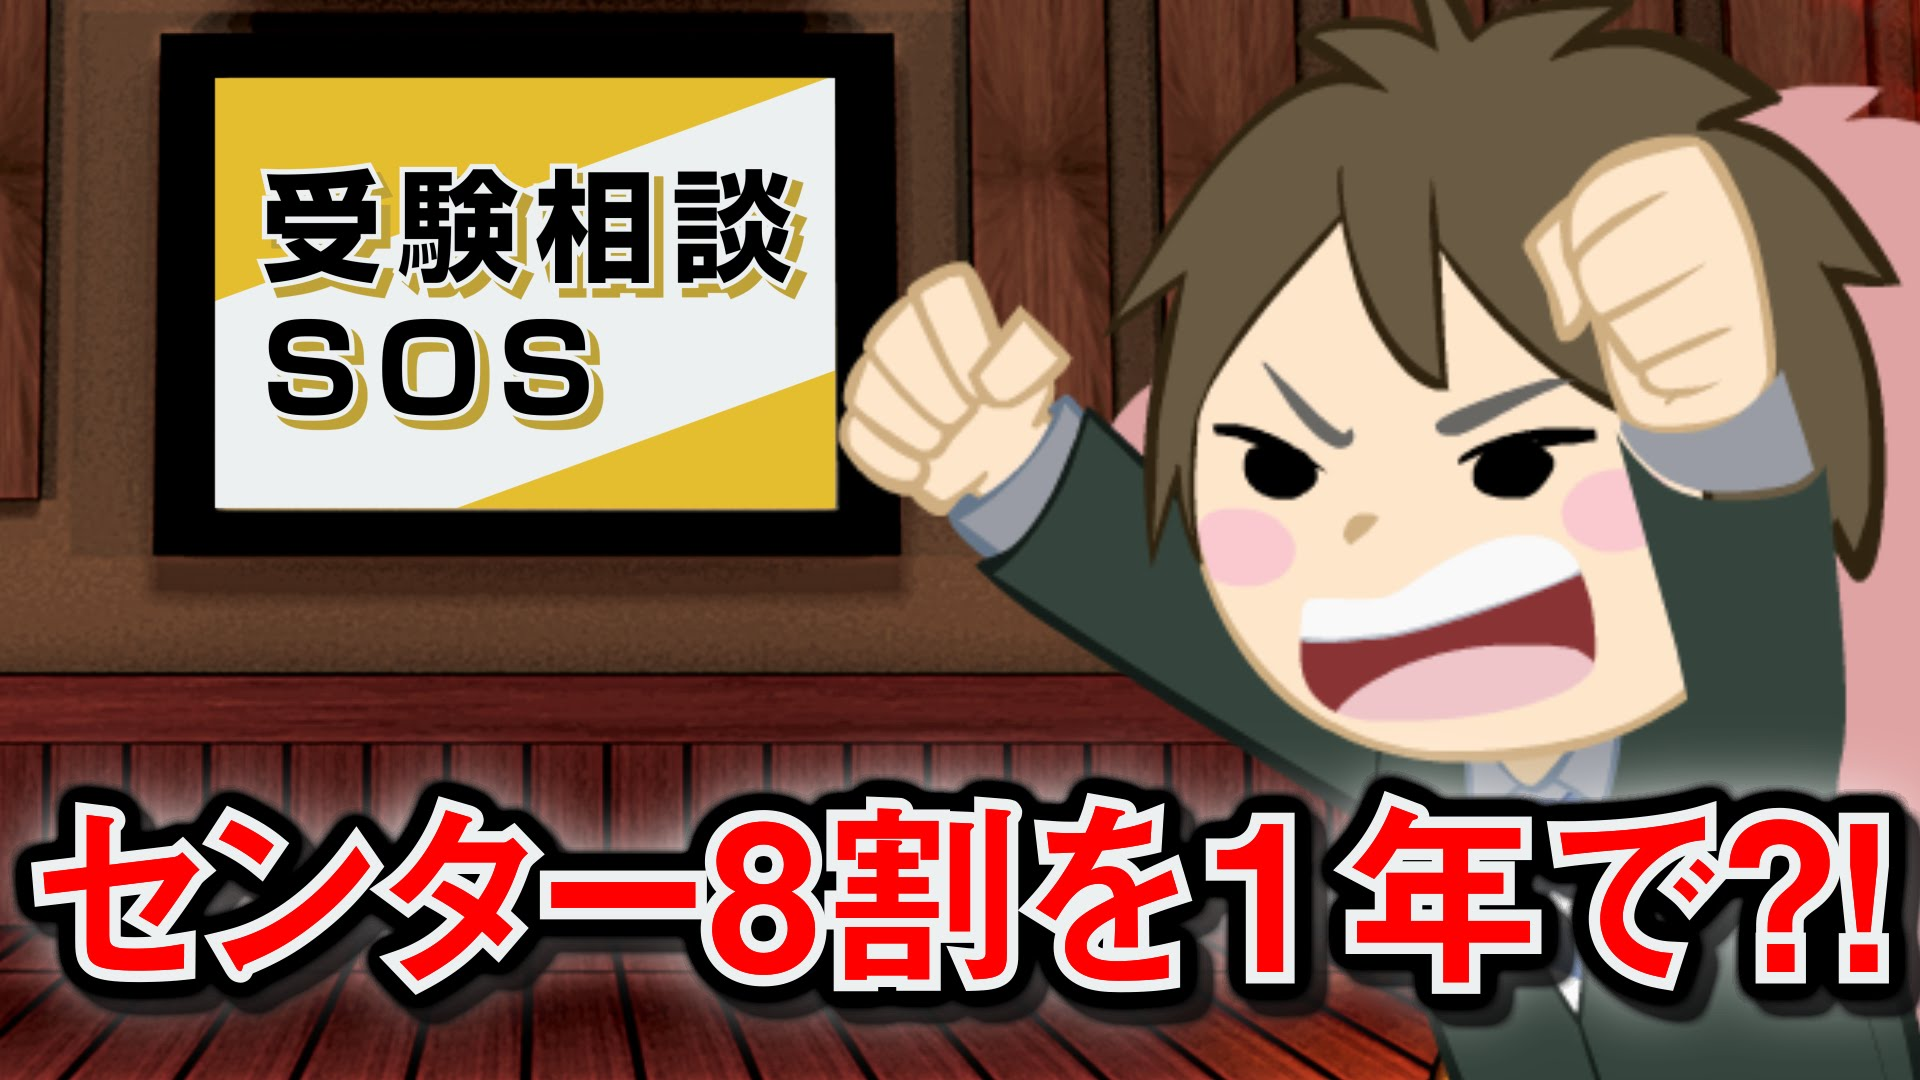 【vol.42】1年間でゼロからセンター試験8割!?|受験相談SOS